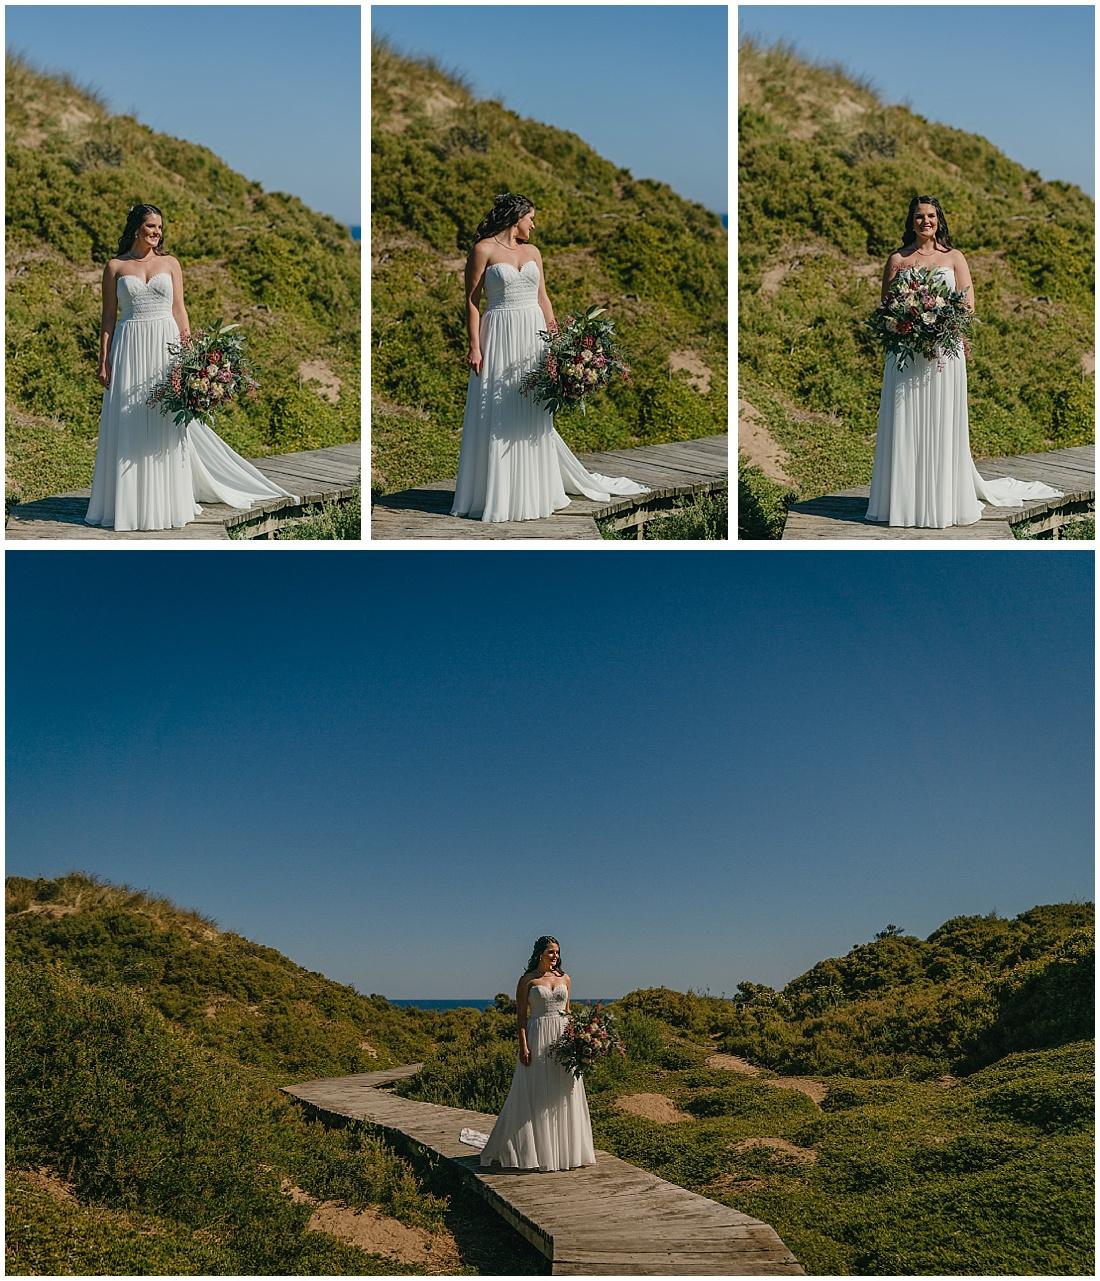 phillip island melbourne wedding photography_0015.jpg